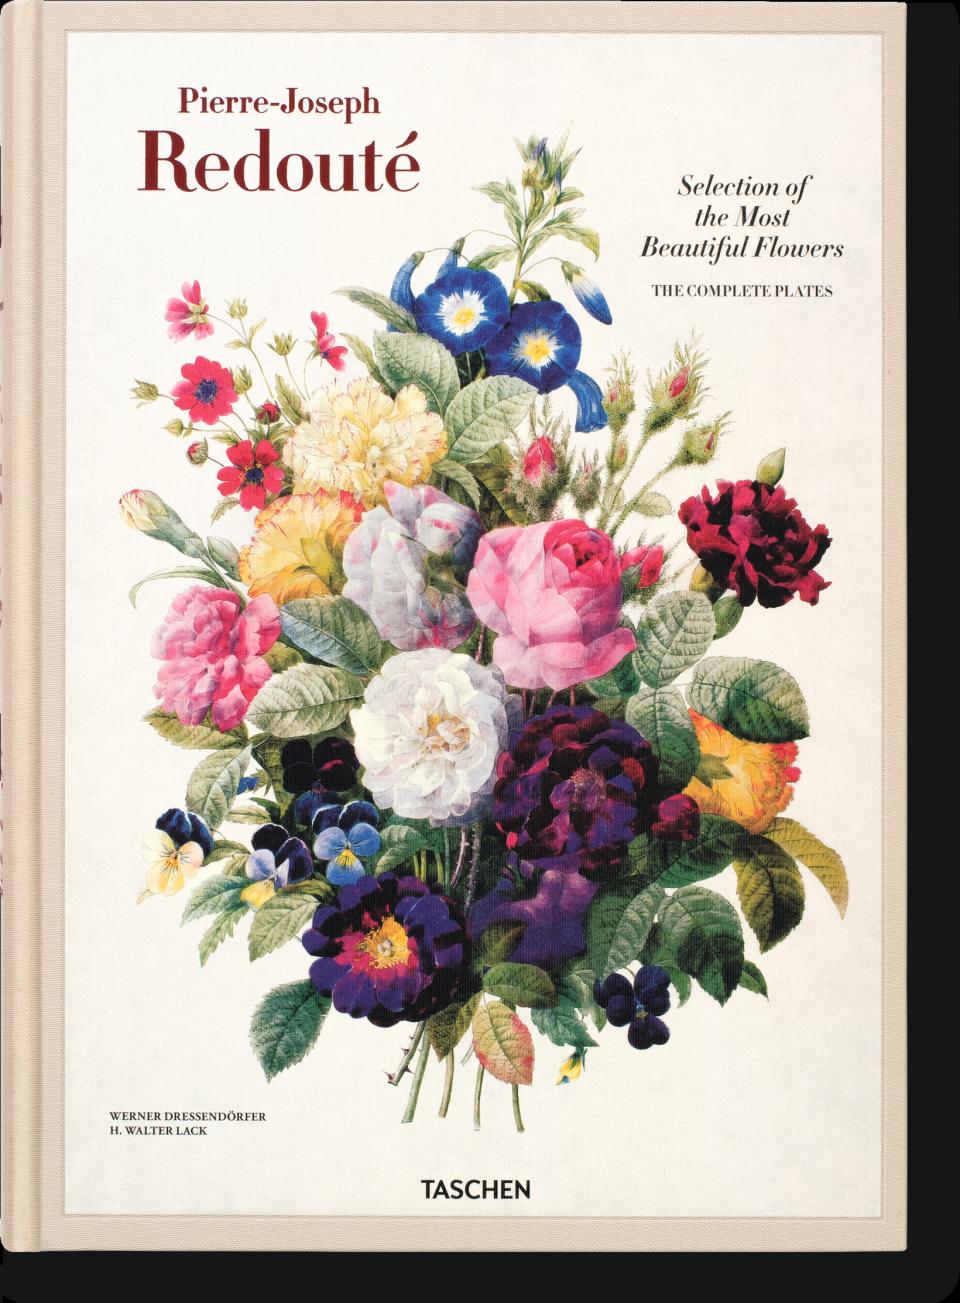 redoute_belles_fleurs_xl_int_3d_00361_1504291211_id_948477.png